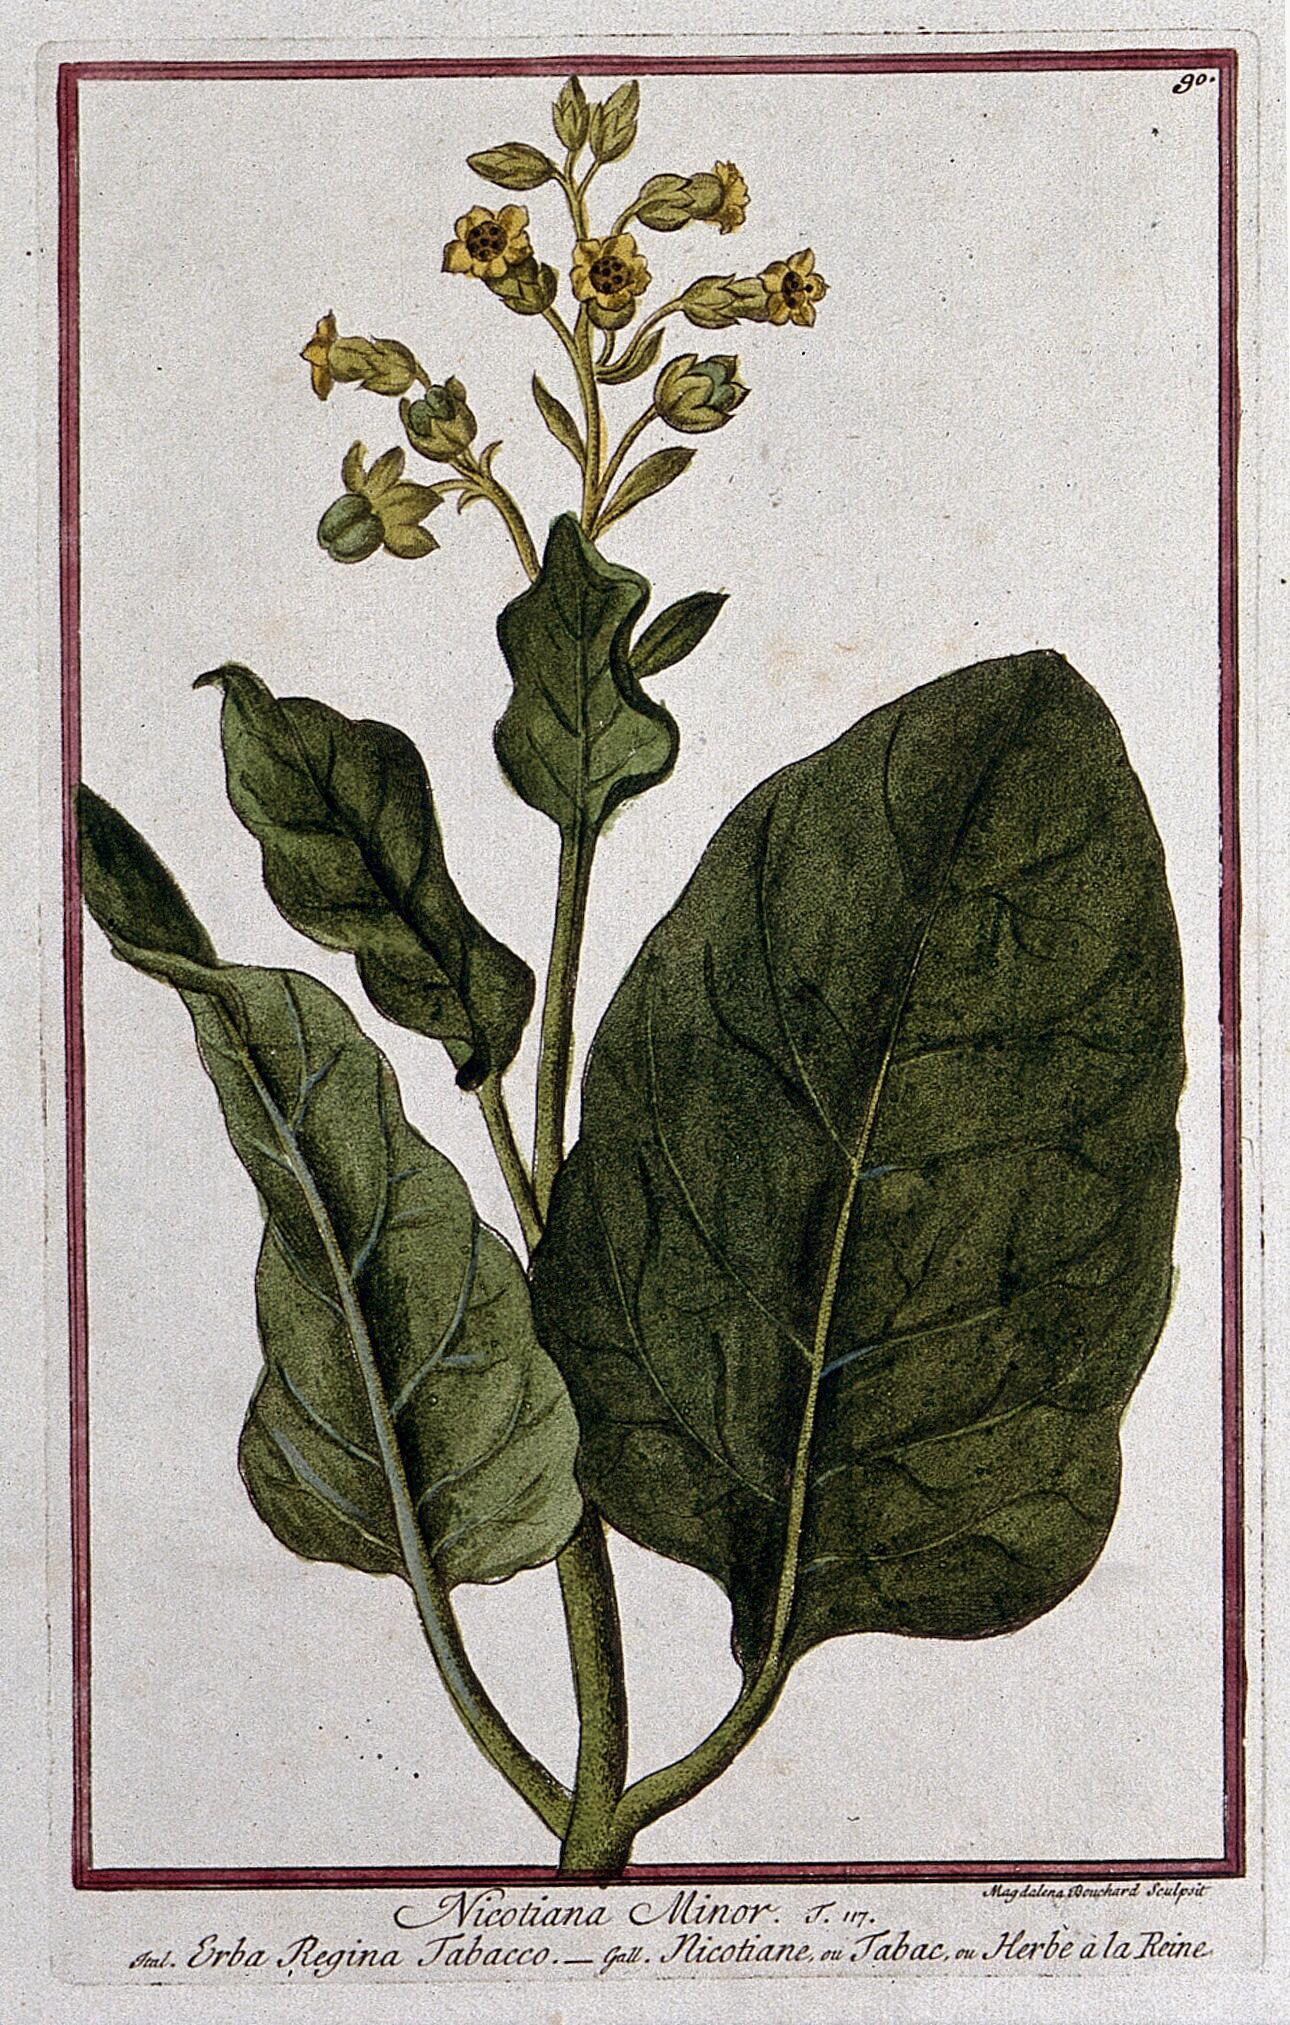 Smoking tobacco (Nicotiana tabacum L ): flowering and